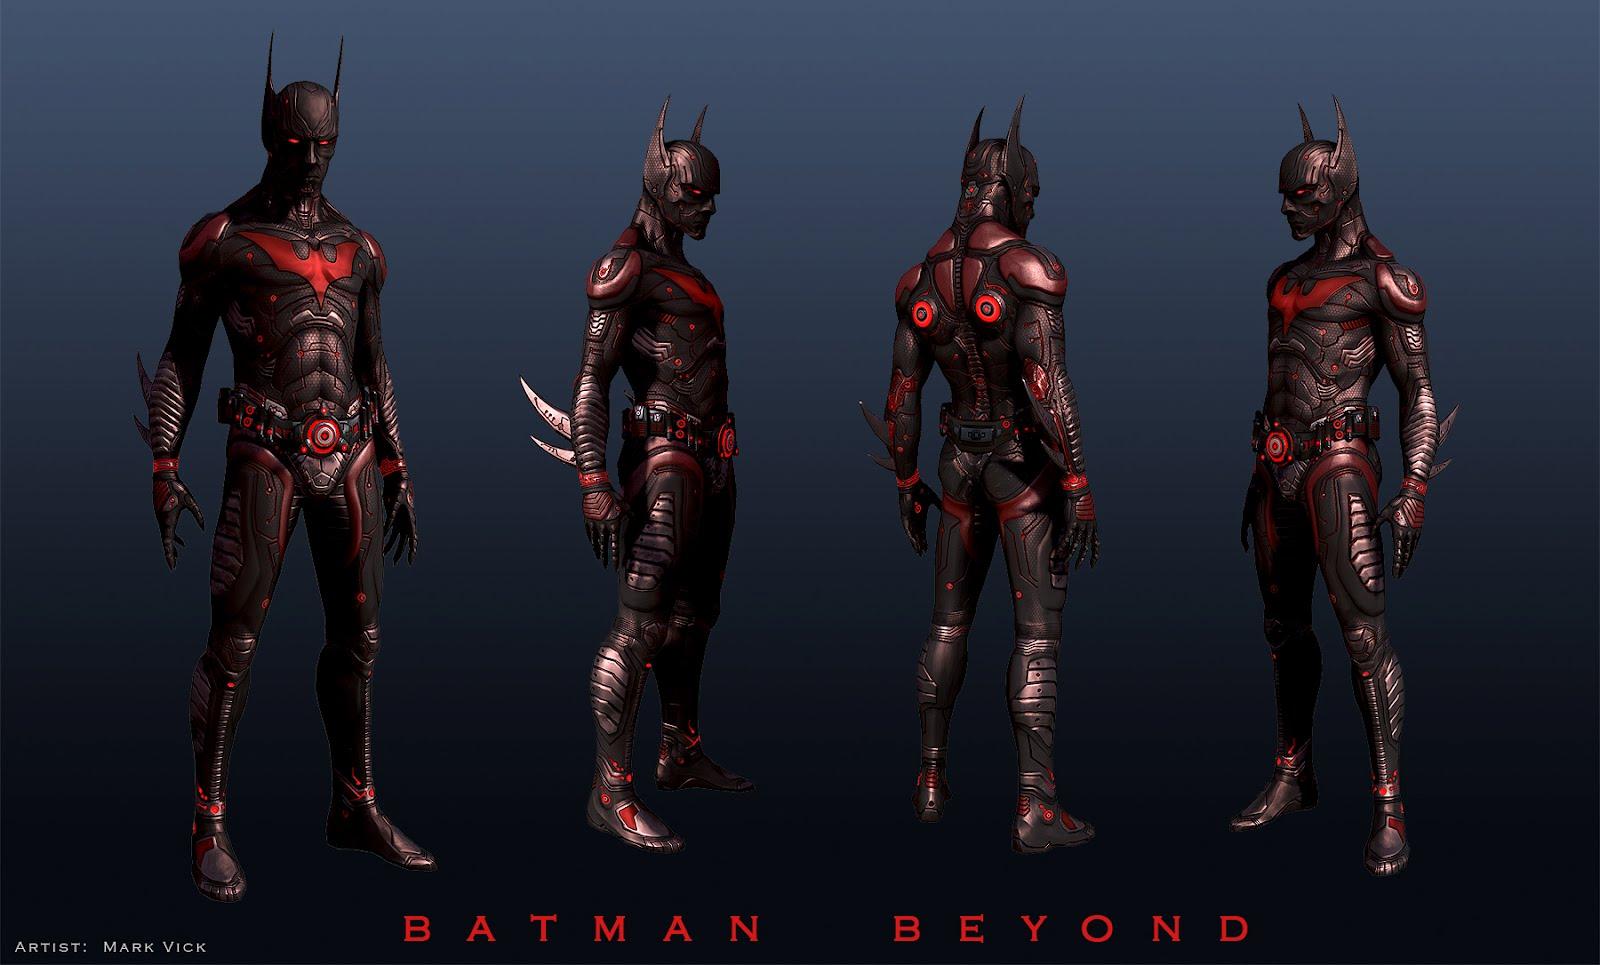 http://4.bp.blogspot.com/-hkuIOUpLg6E/T1ufP3T7IAI/AAAAAAAALrs/fGDezl3sU9M/s1600/Batman-Beyond_MarkVick.jpg